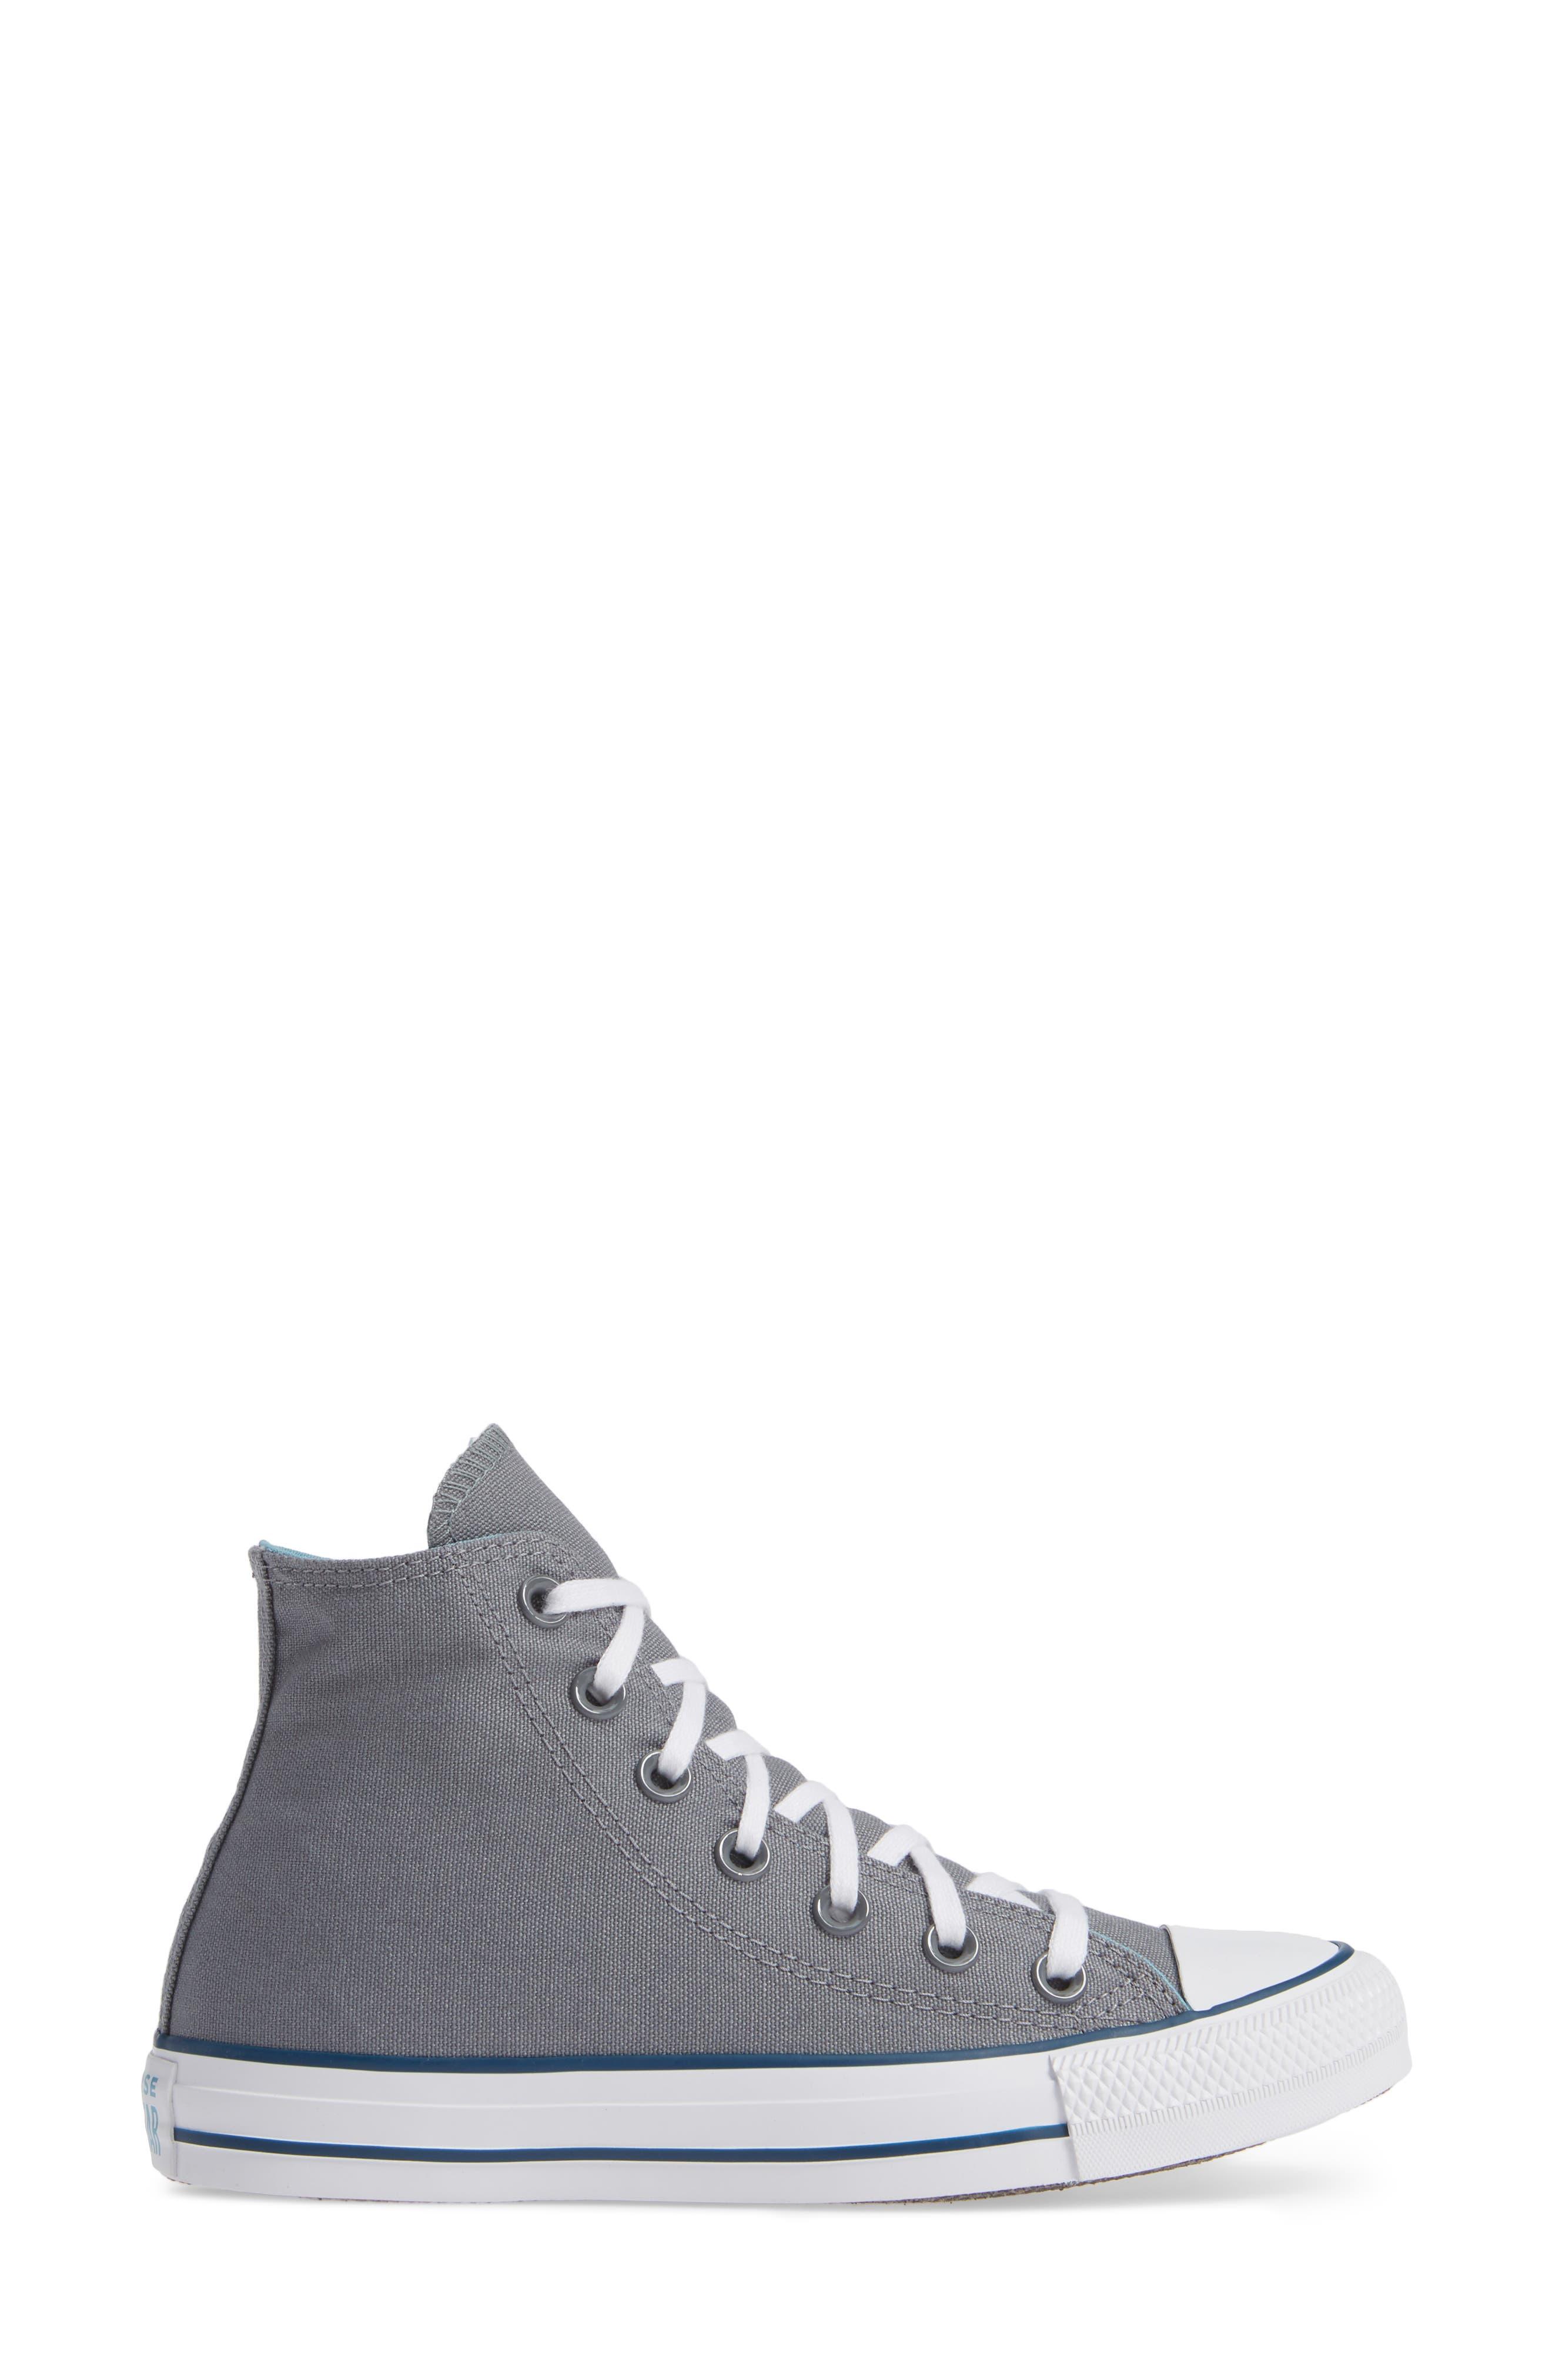 Chuck Taylor<sup>®</sup> All Star<sup>®</sup> Seasonal Hi Sneaker,                             Alternate thumbnail 3, color,                             039